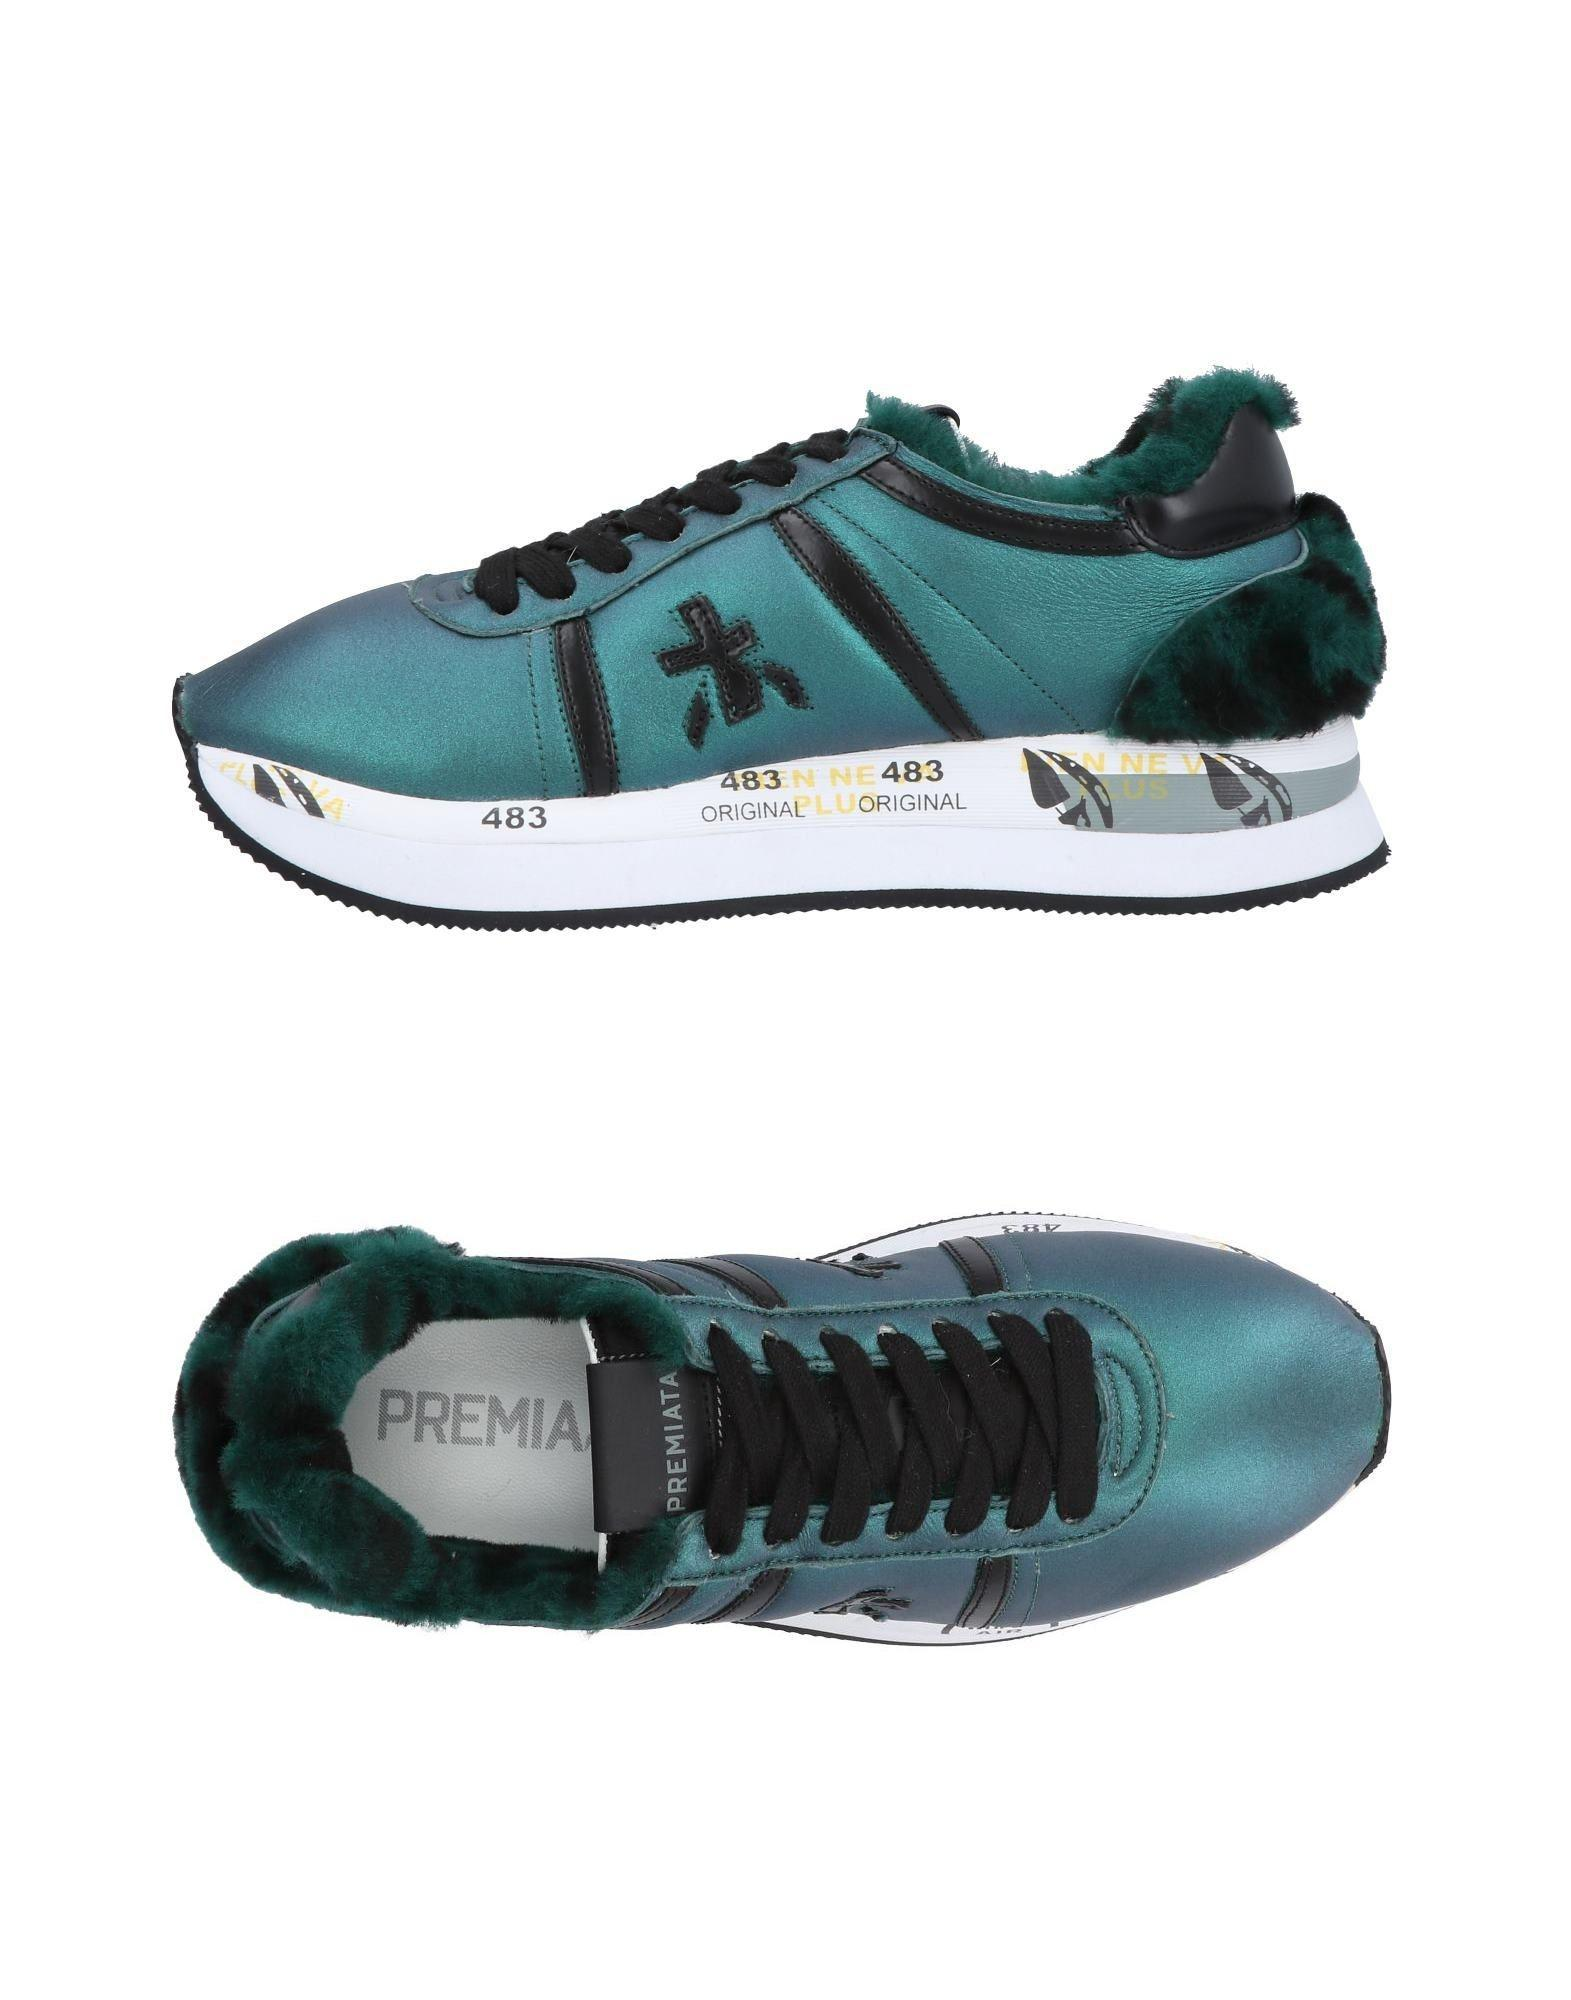 Premiata Verde amp  Sneakers Lyst Deportivas Color De taSYaqw8 e7fefecba1a3